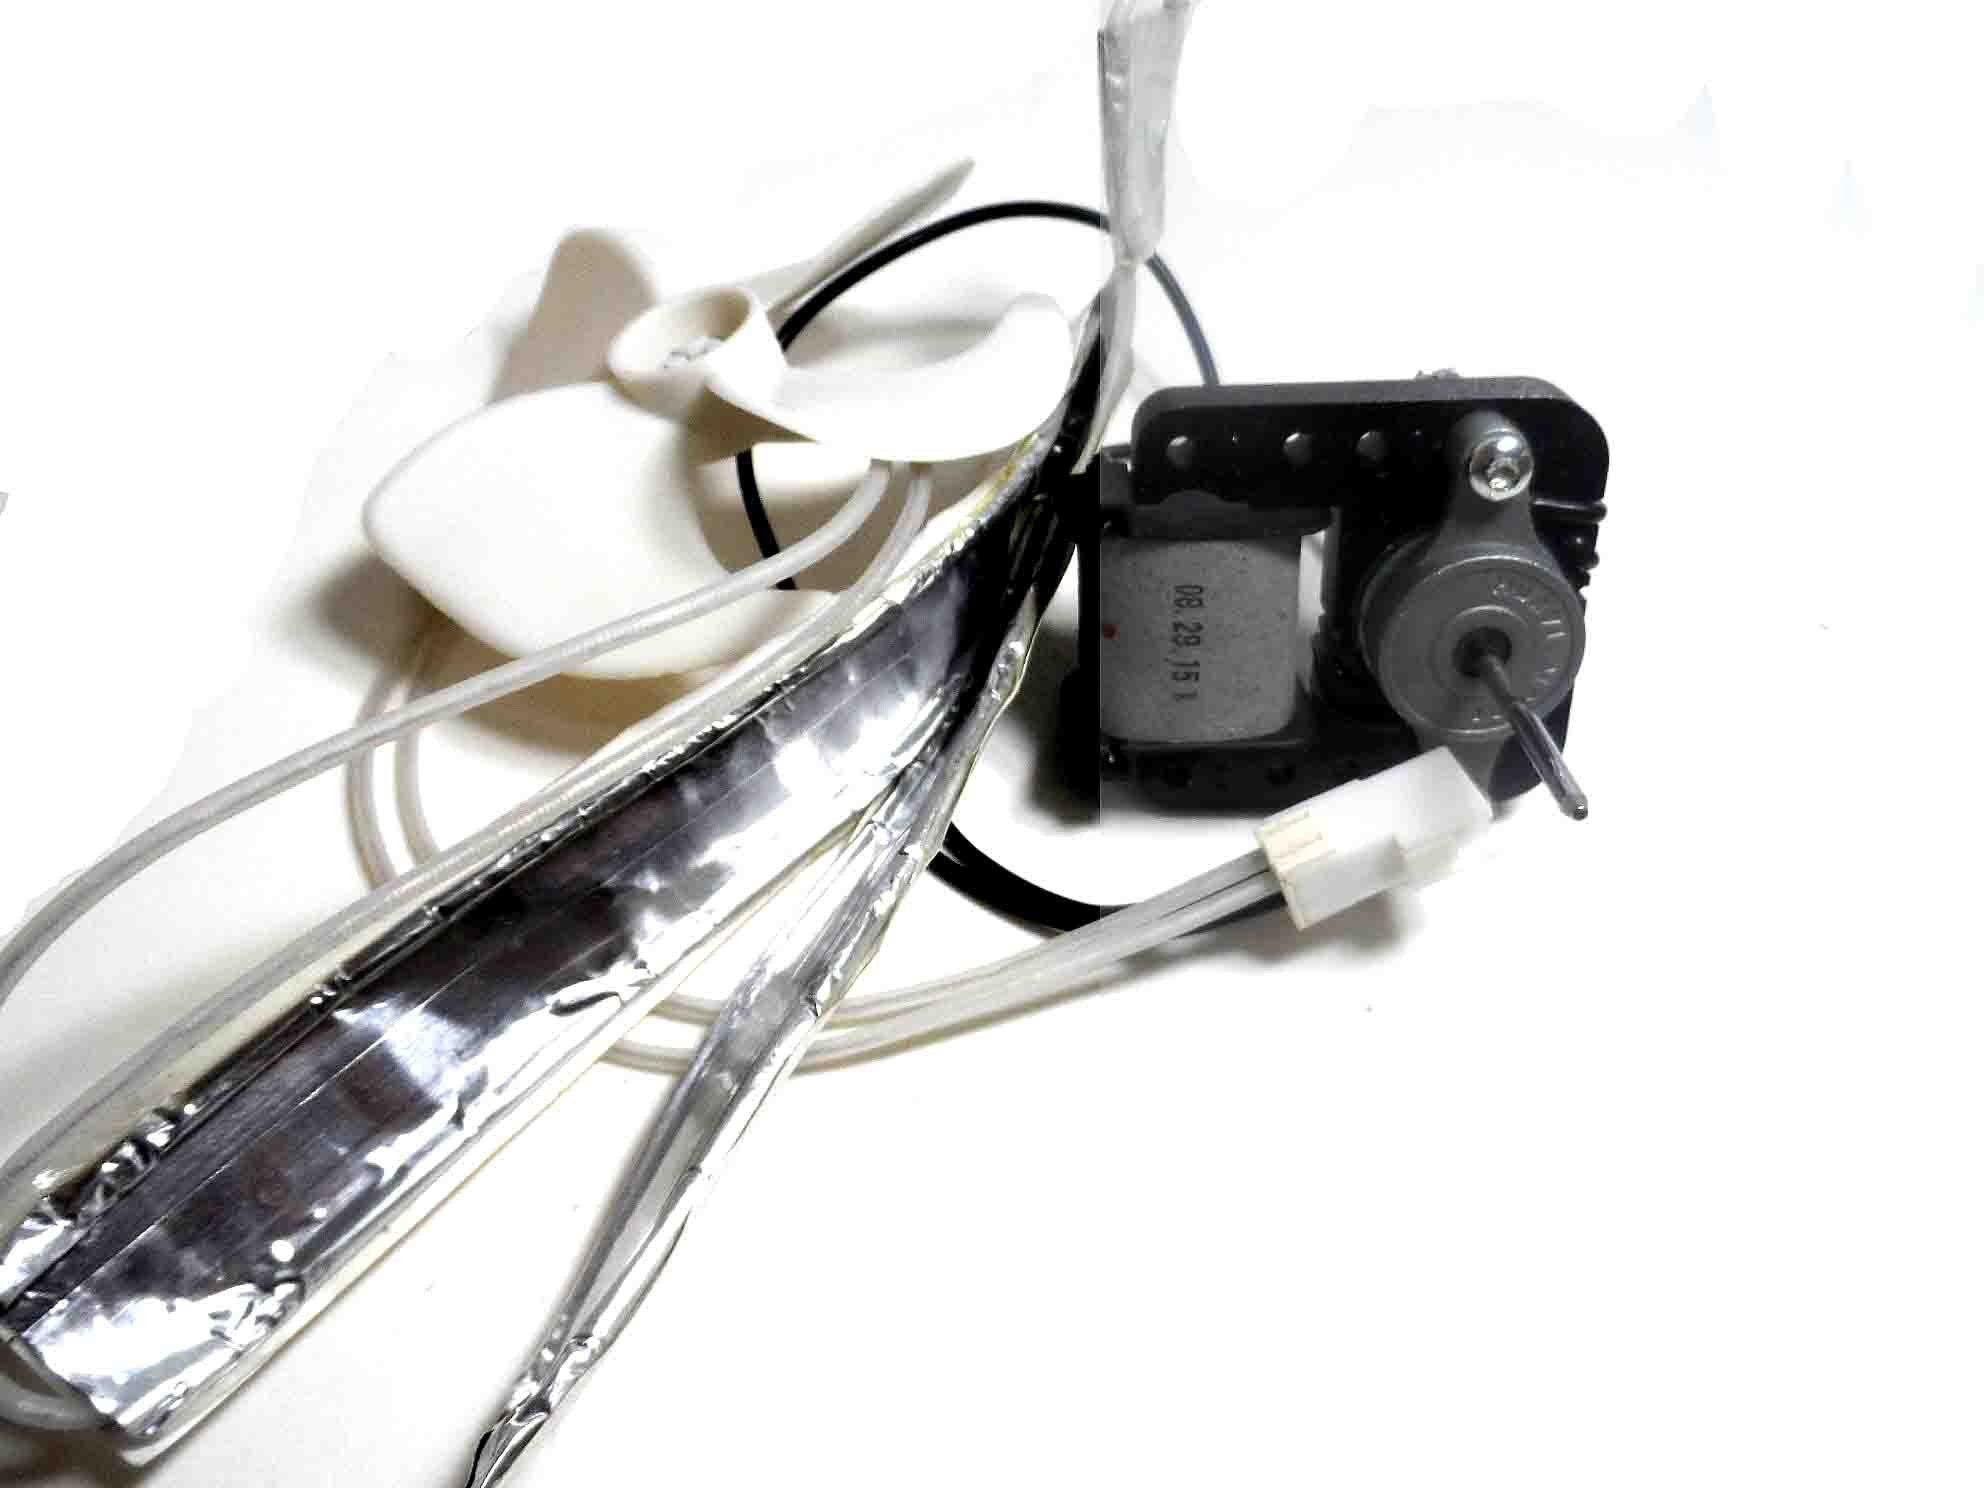 RESISTÊNCIA DRENO VENTILADOR REFRIGERADOR ELECTROLUX 4600171